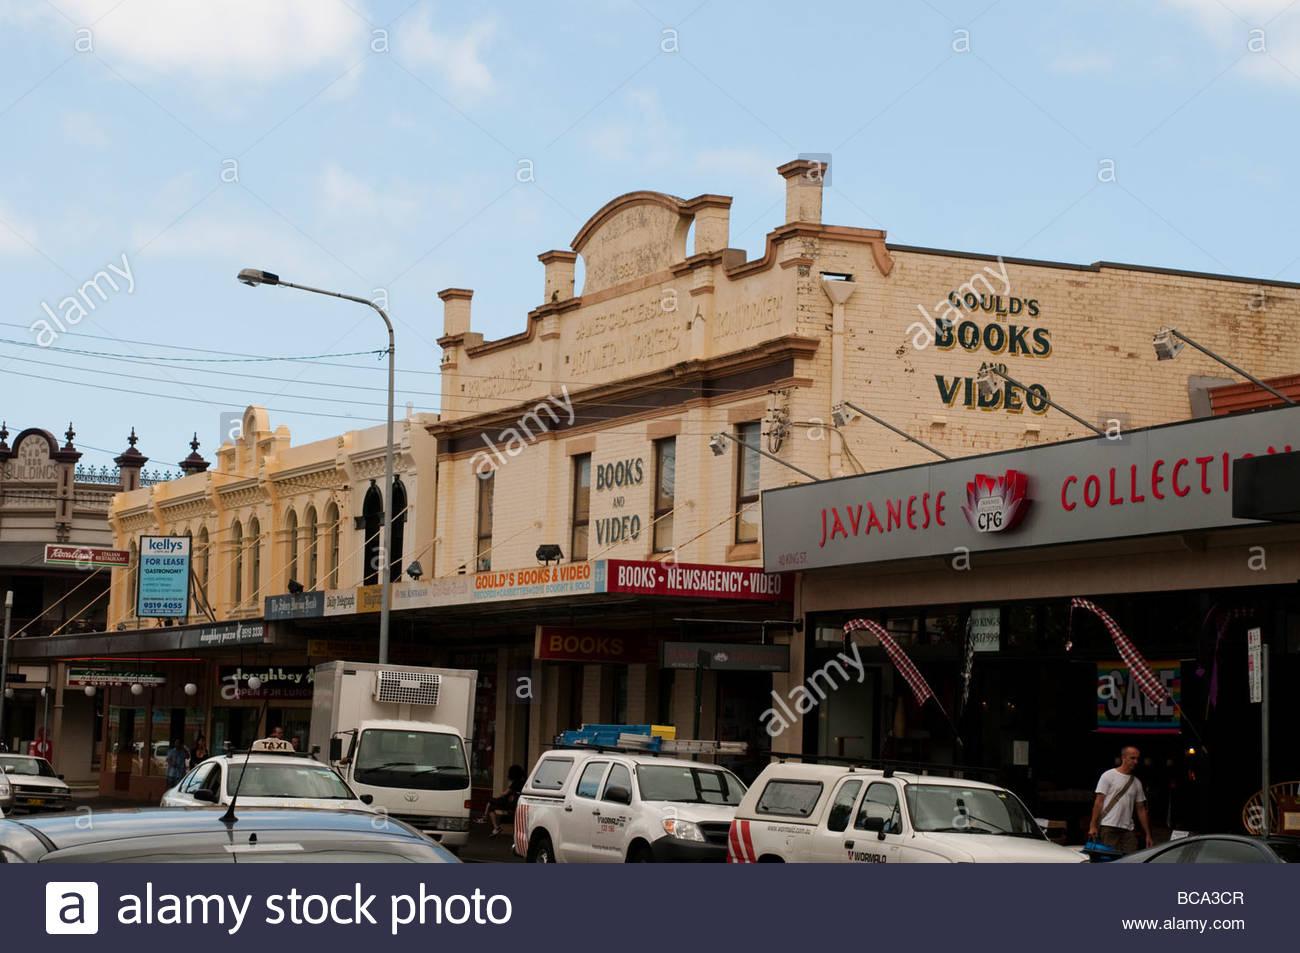 Gould's Books Video secondhand bookshop on King Street Newtown Sydney NSW Australia - Stock Image